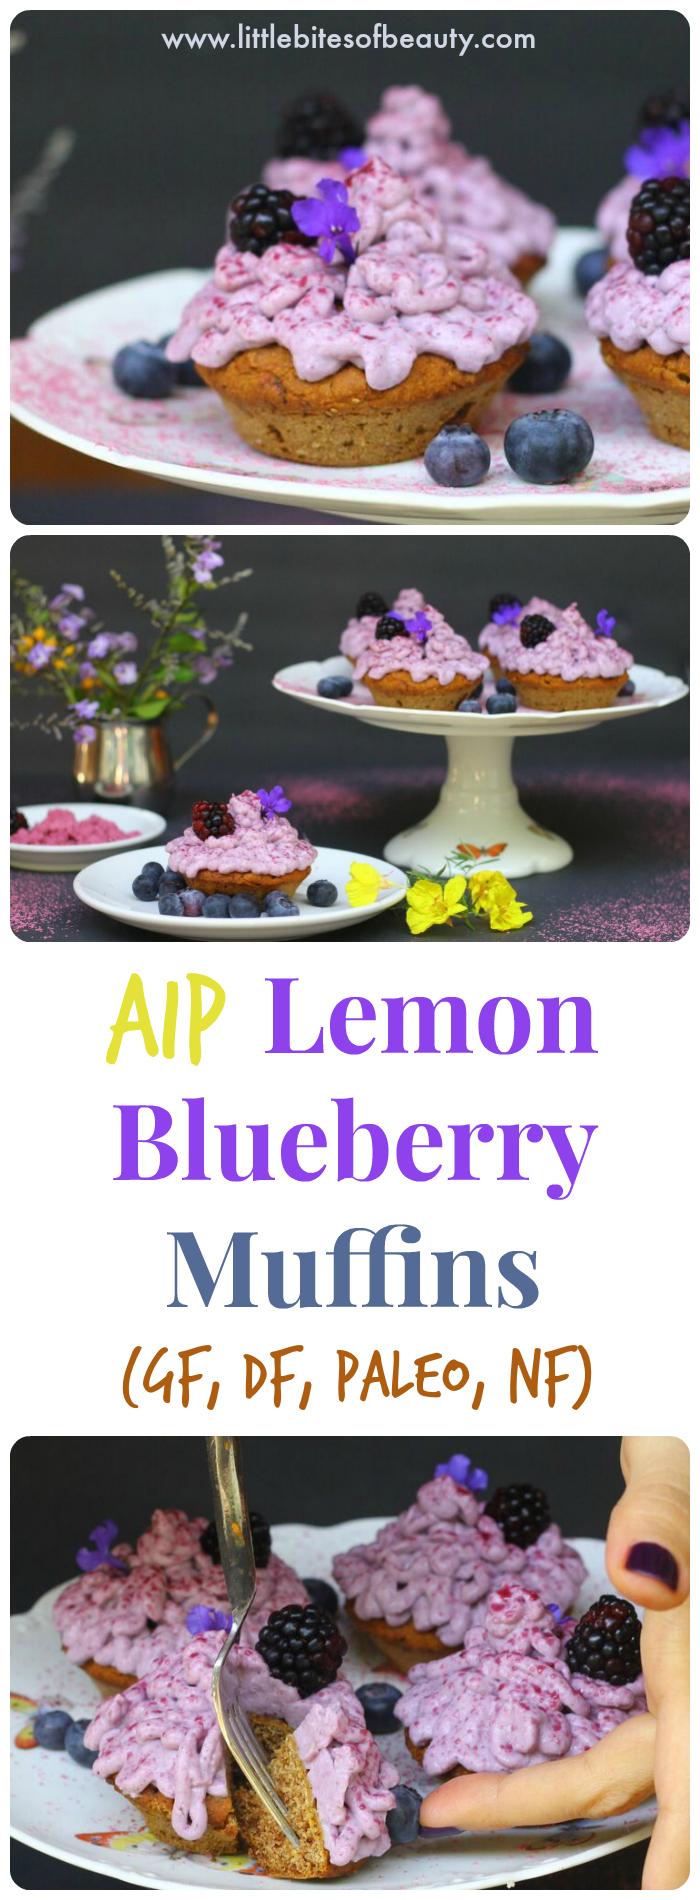 AIP Lemon Blueberry Muffins (GF, DF, Paleo, NF)